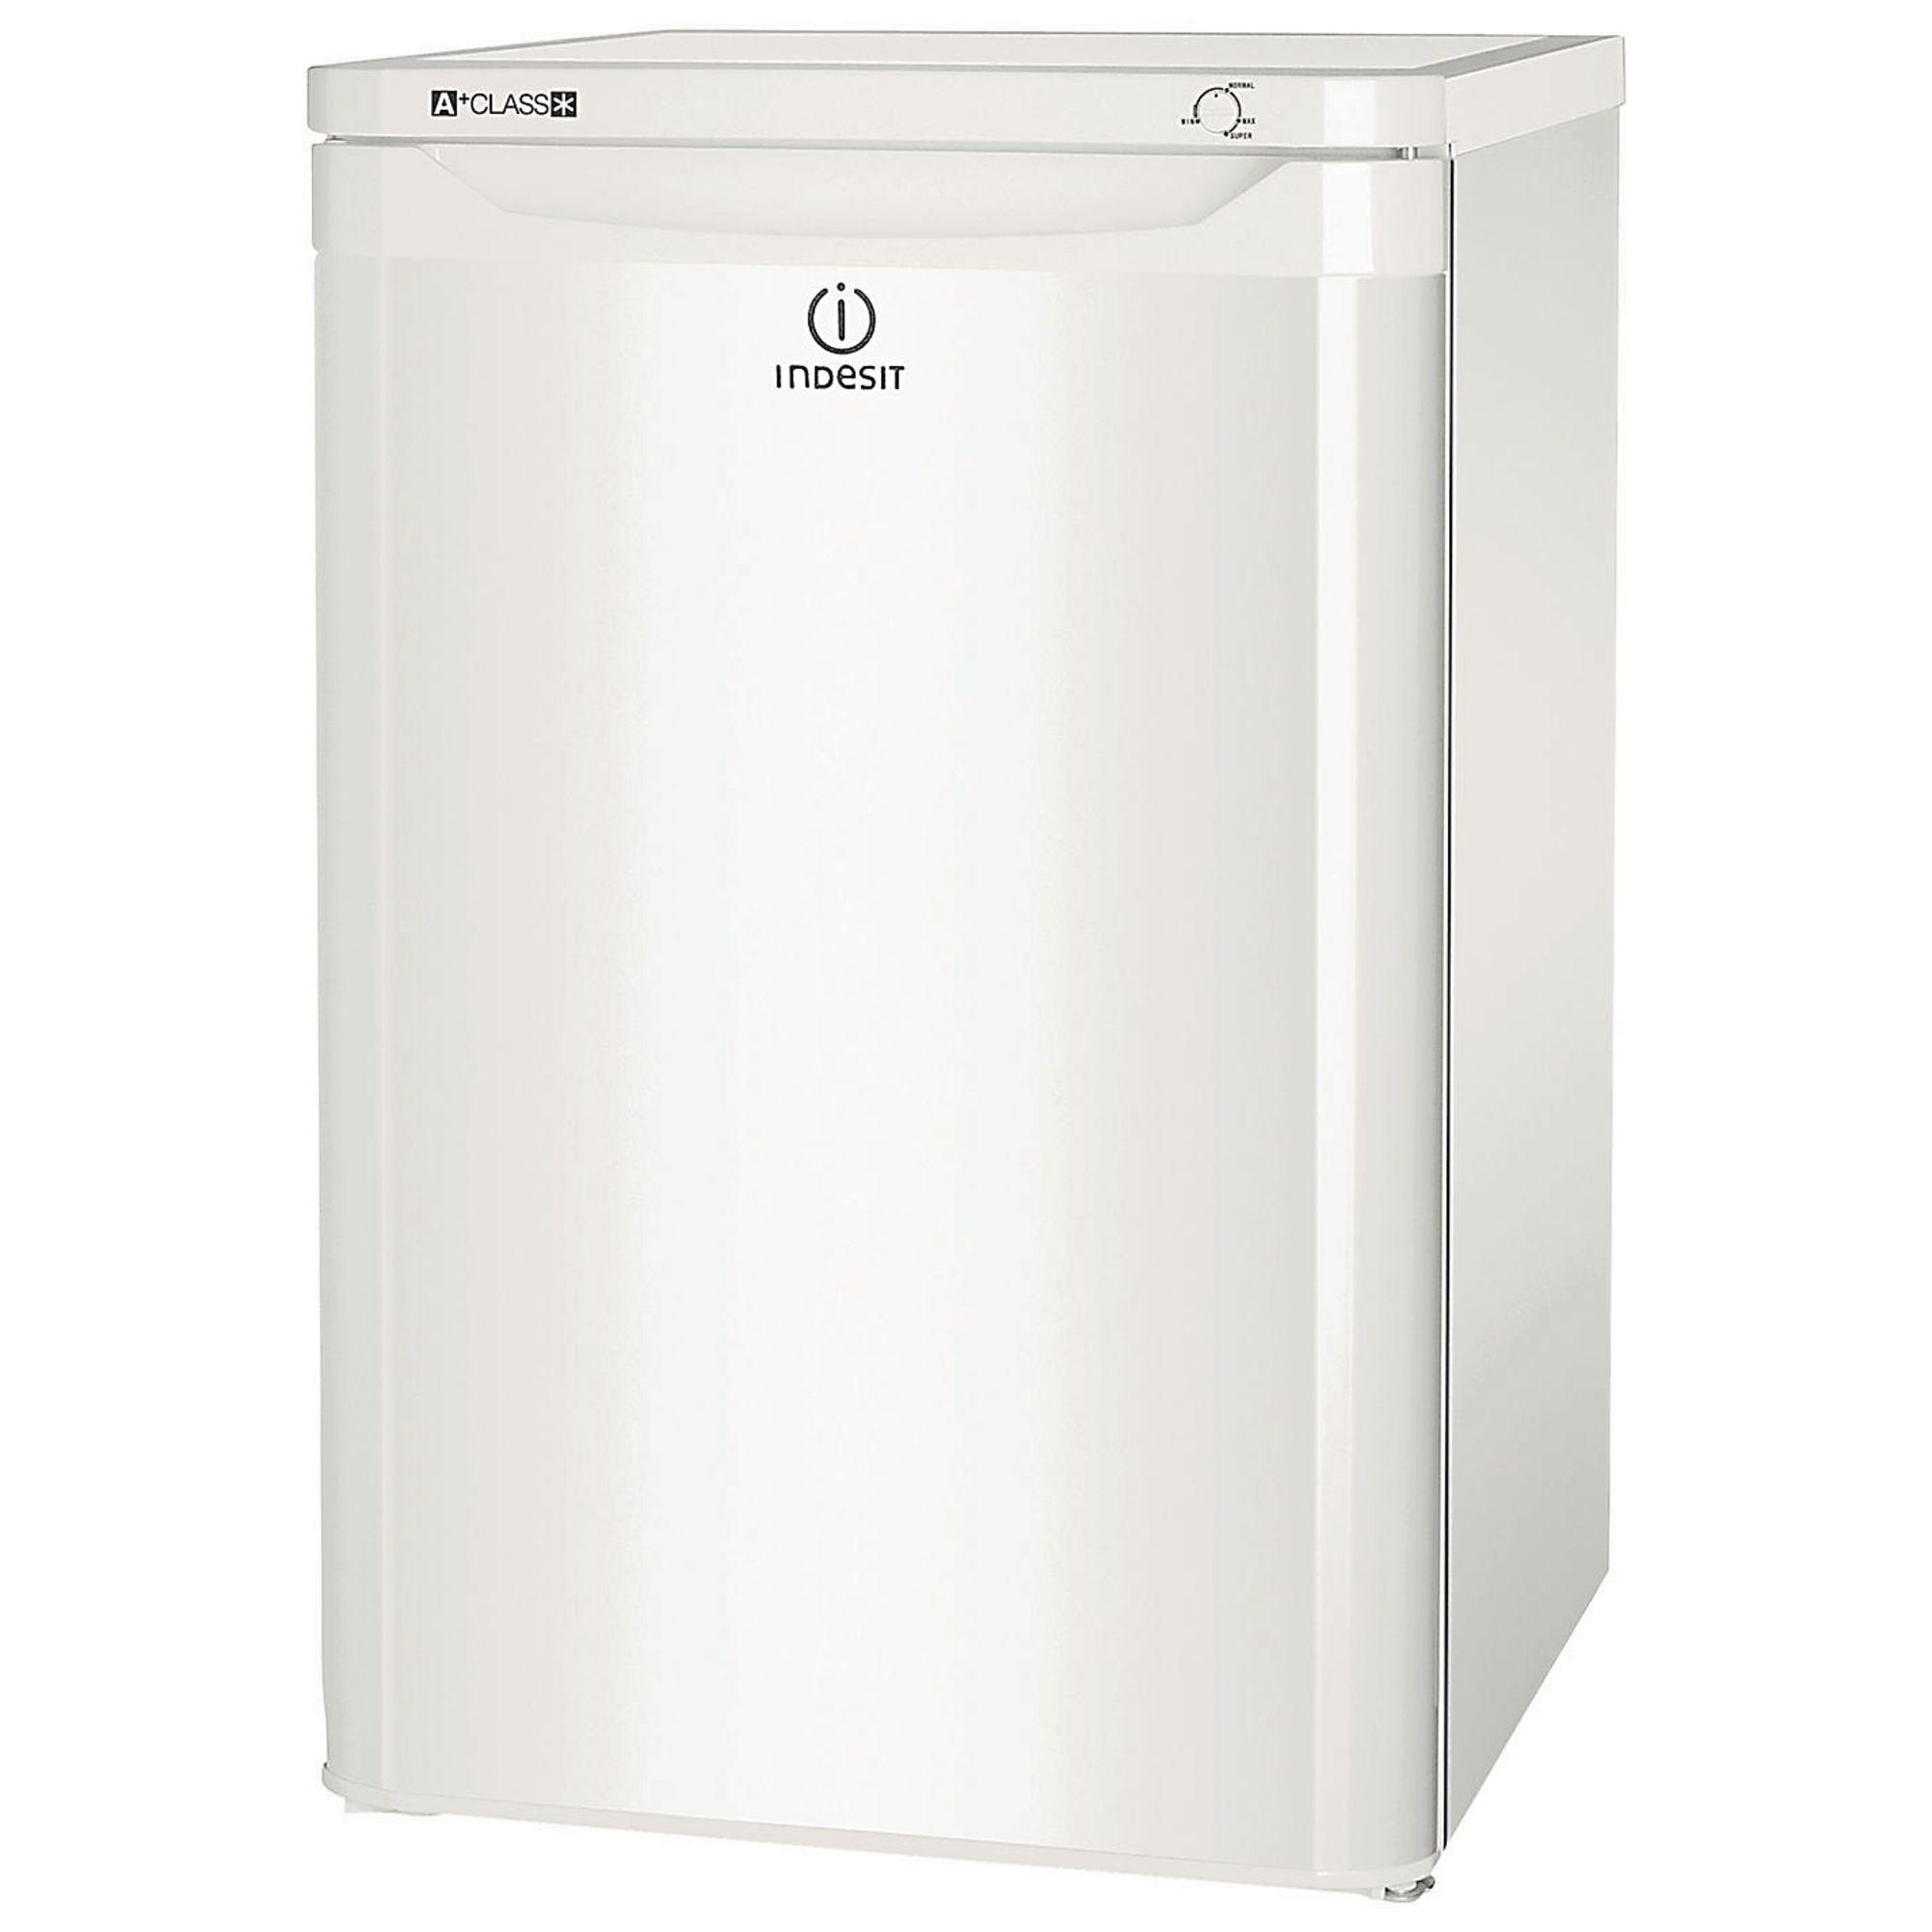 E8R06702 - Indesit Undercounter Freezer